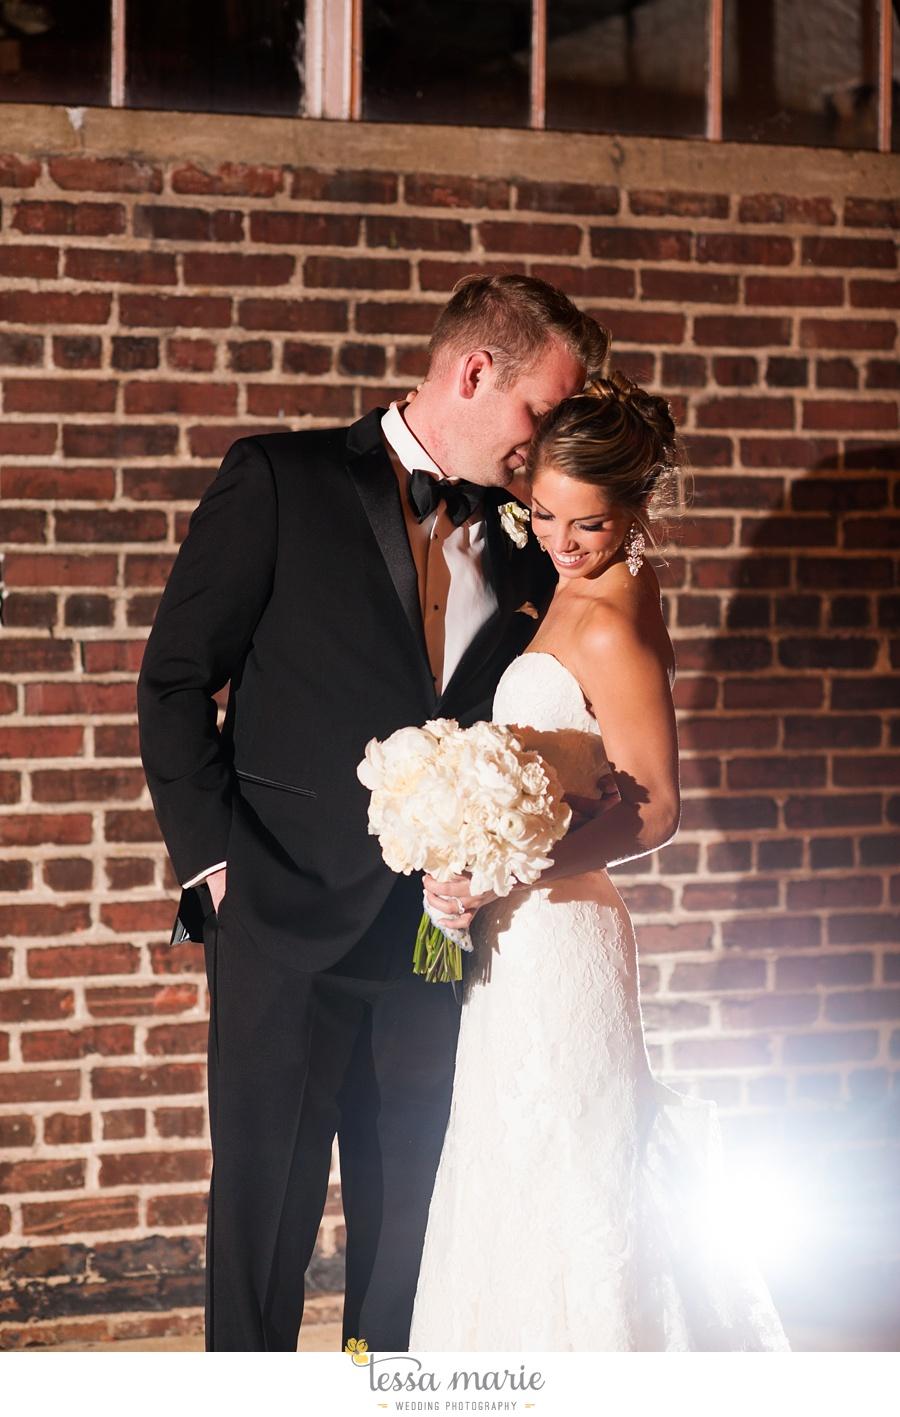 347_tessa_marie_weddings_emotional_moments_photography_king_low_wedding_sam_neil_best_atlanta_wedding_photographer